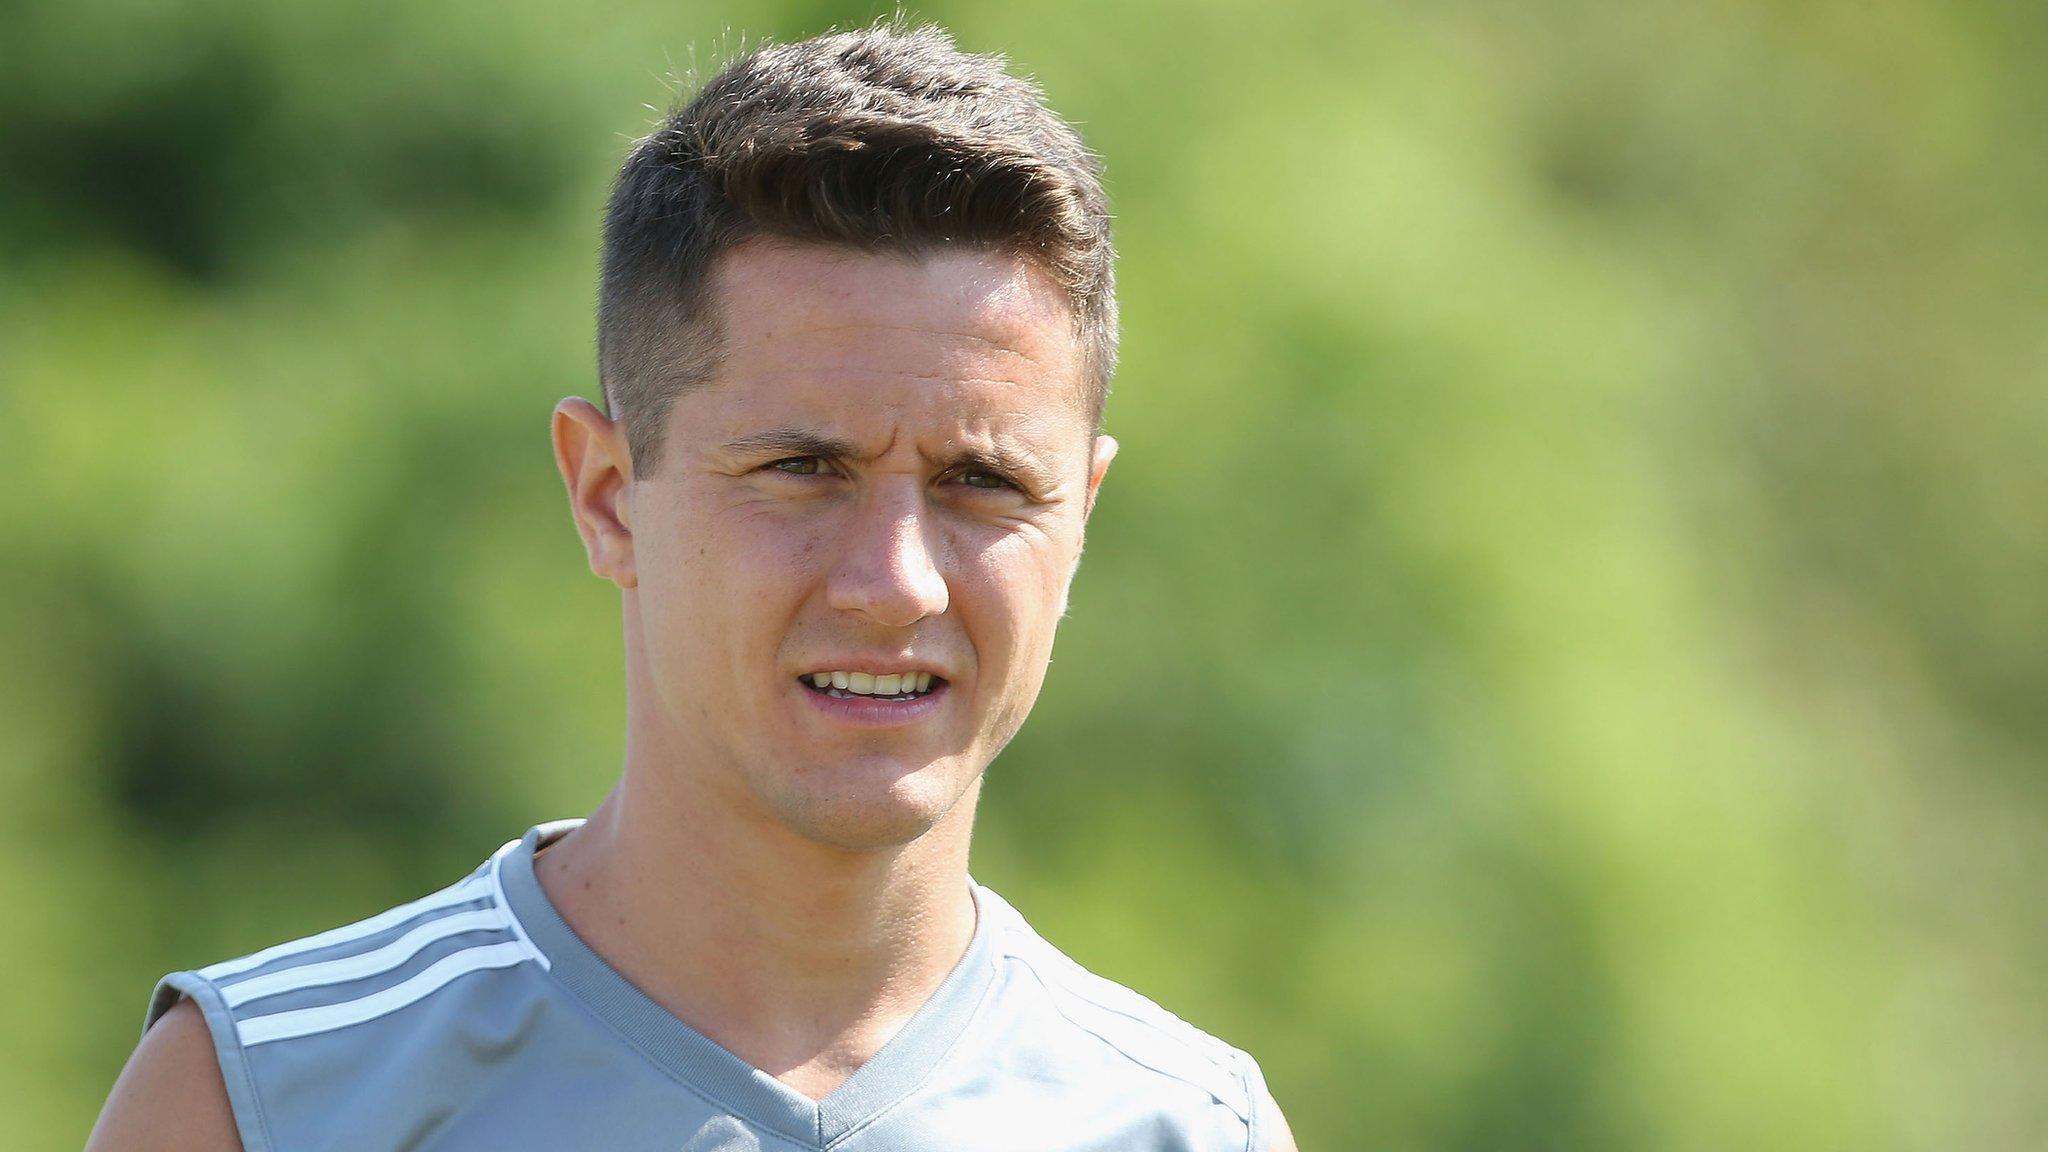 Barcelona want Herrera, Kane to reject Real Madrid - gossip